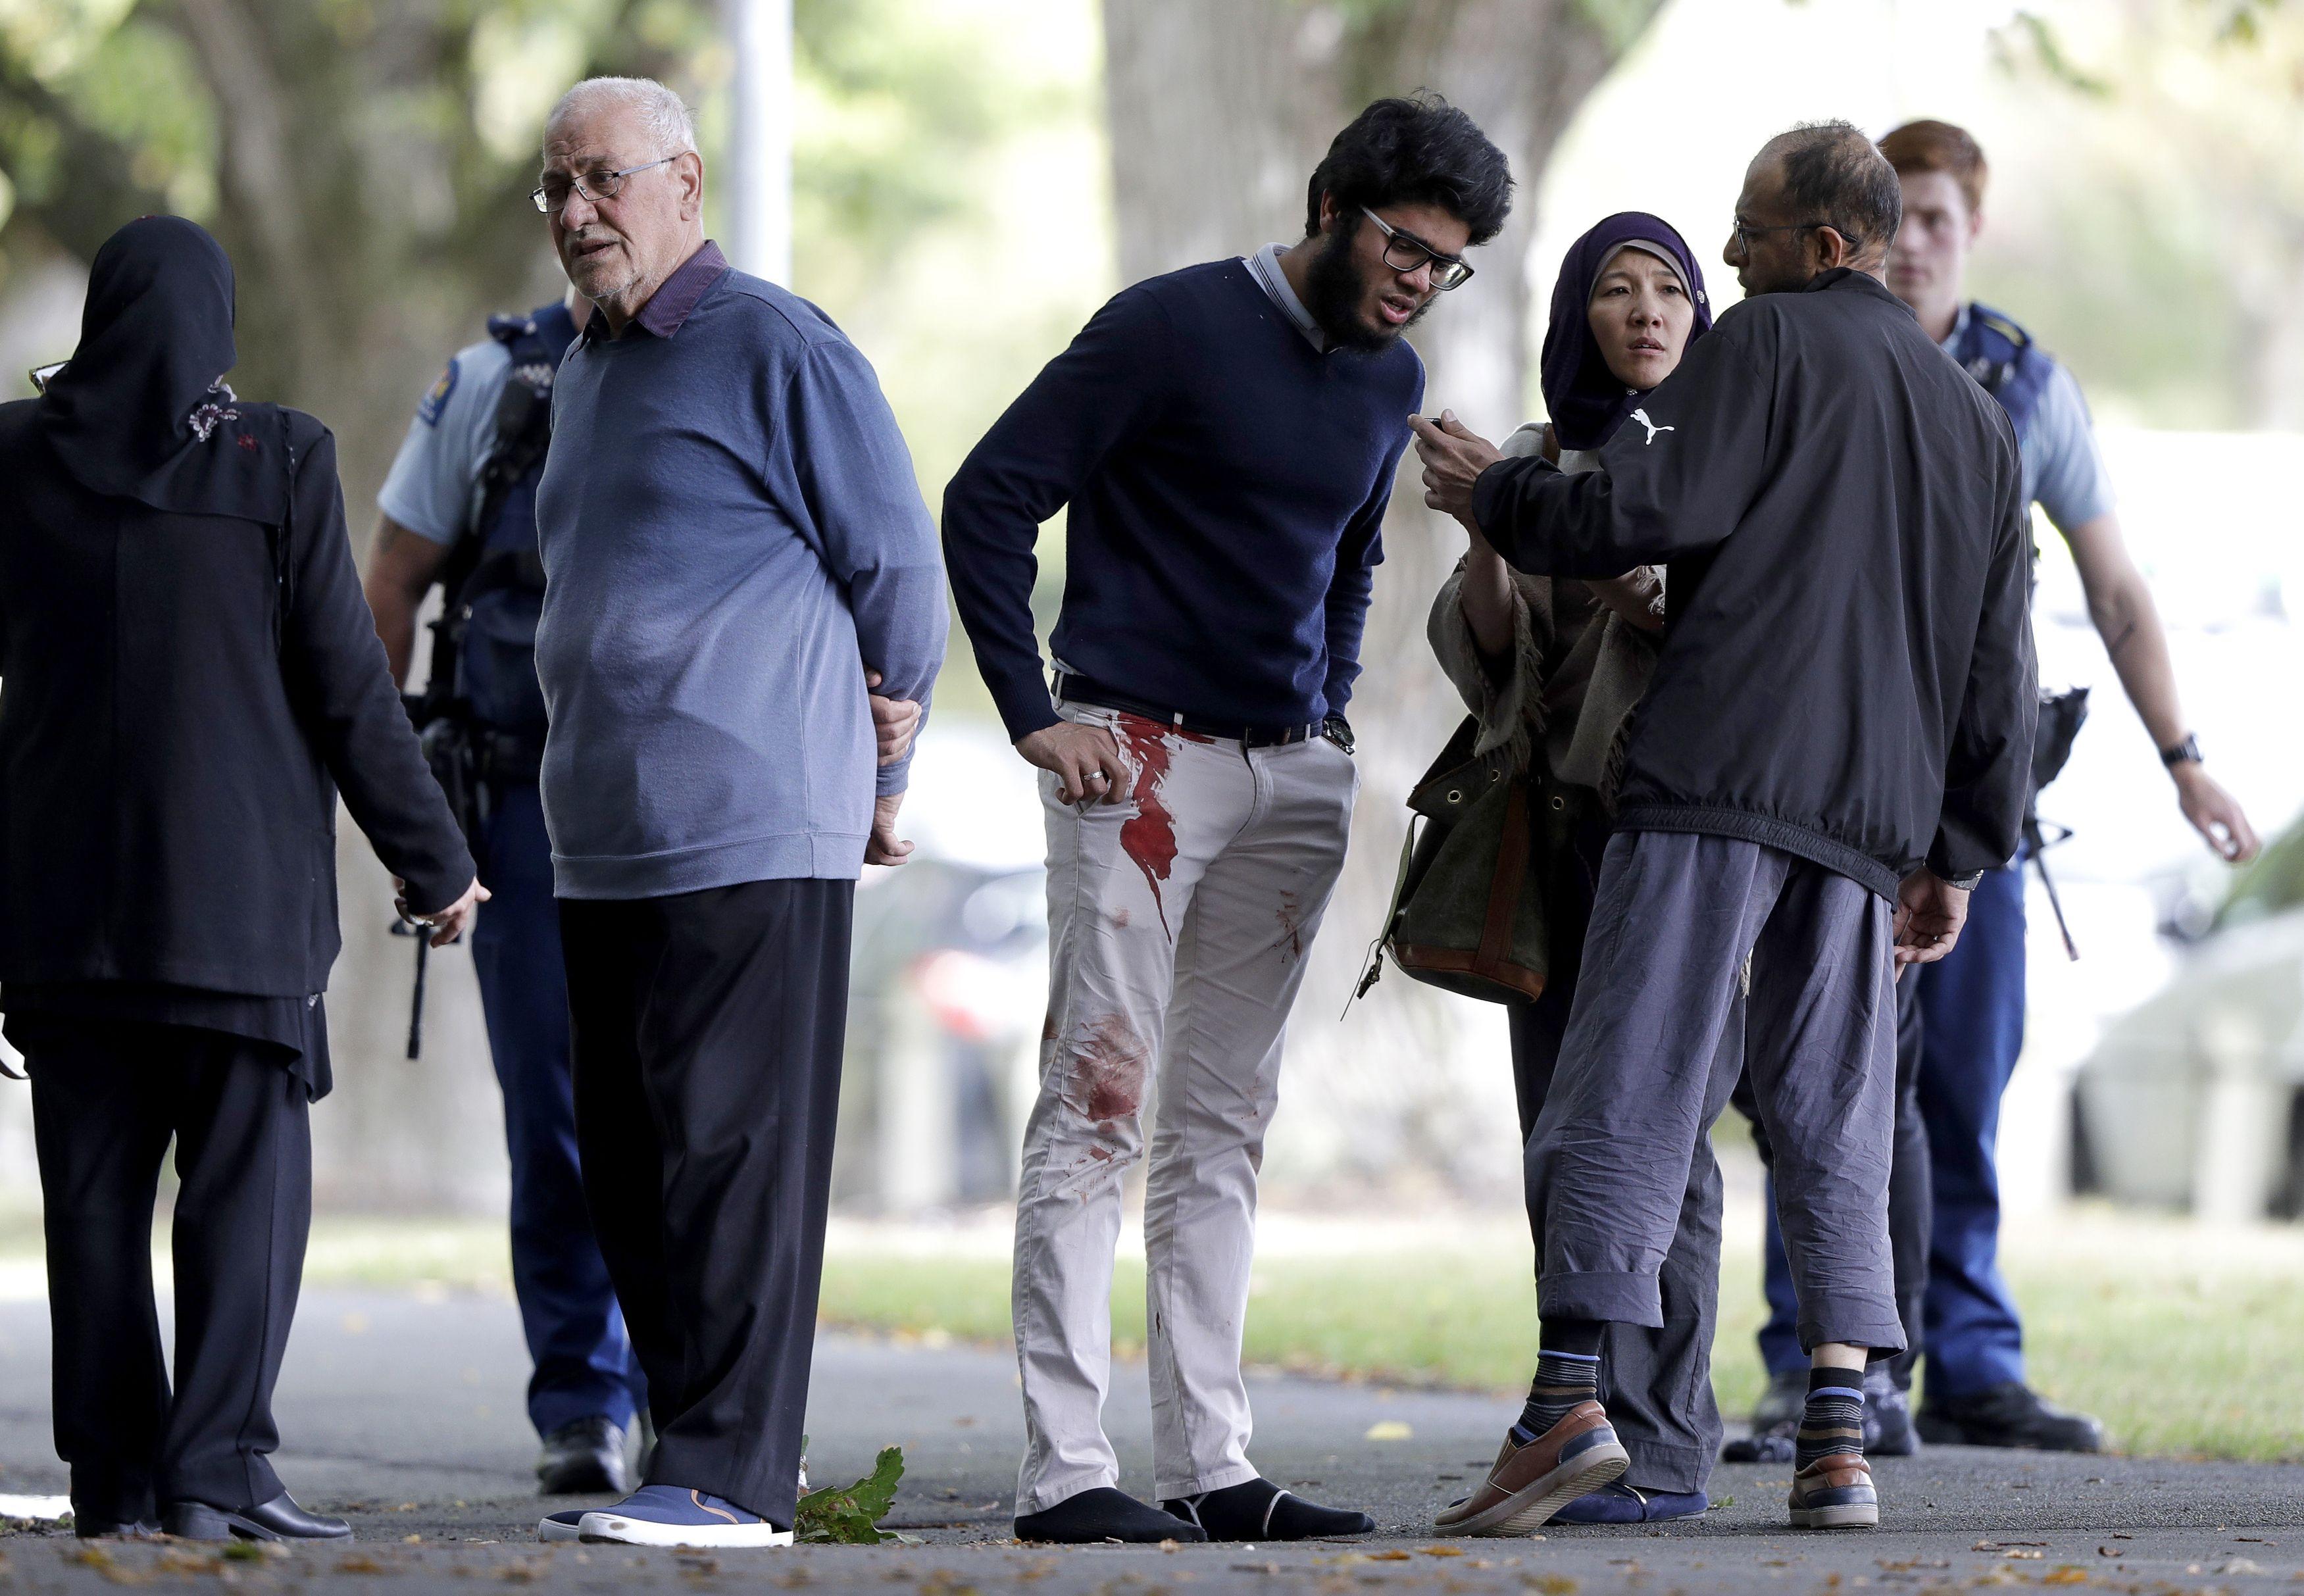 Tiroteos en mezquitas de Nueva Zelanda dejan 49 muertos